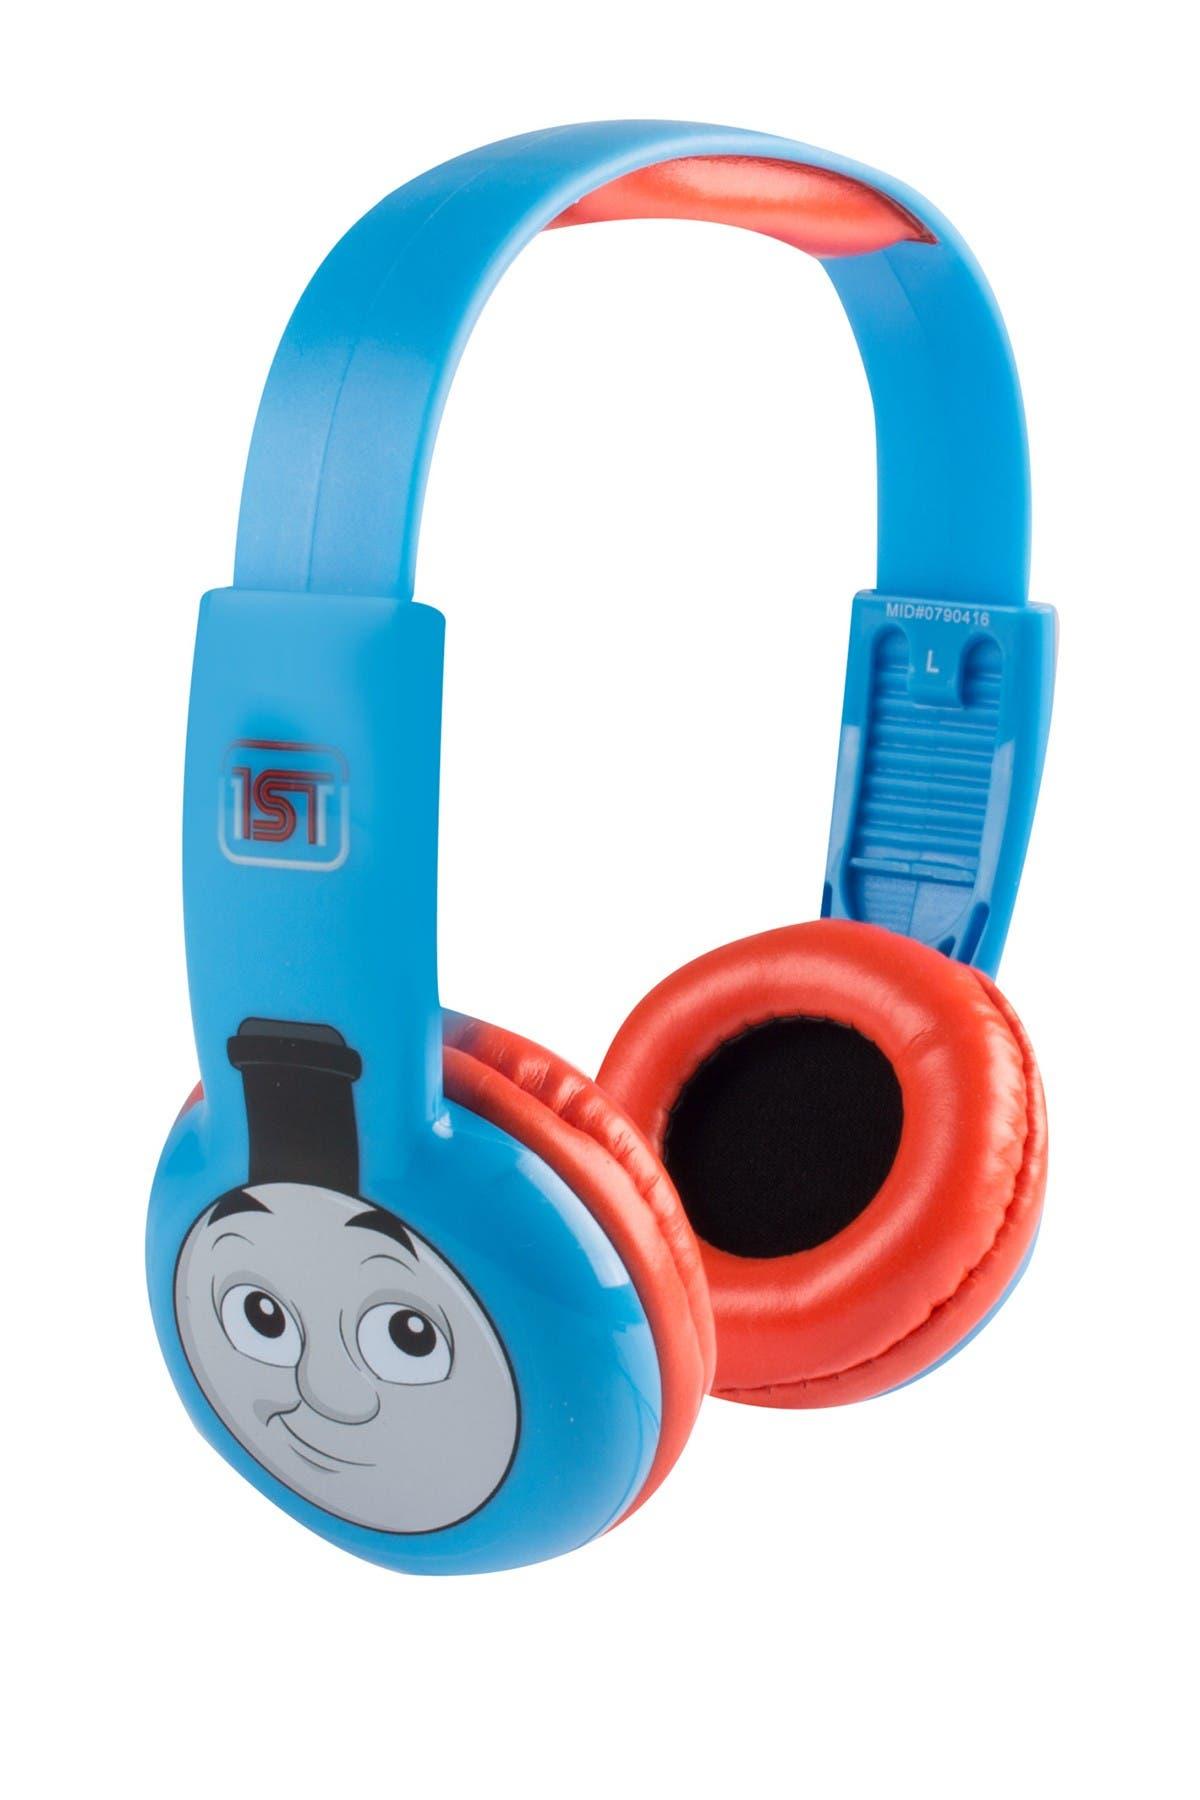 Image of VIVITAR Thomas Kids-Safe Headphones